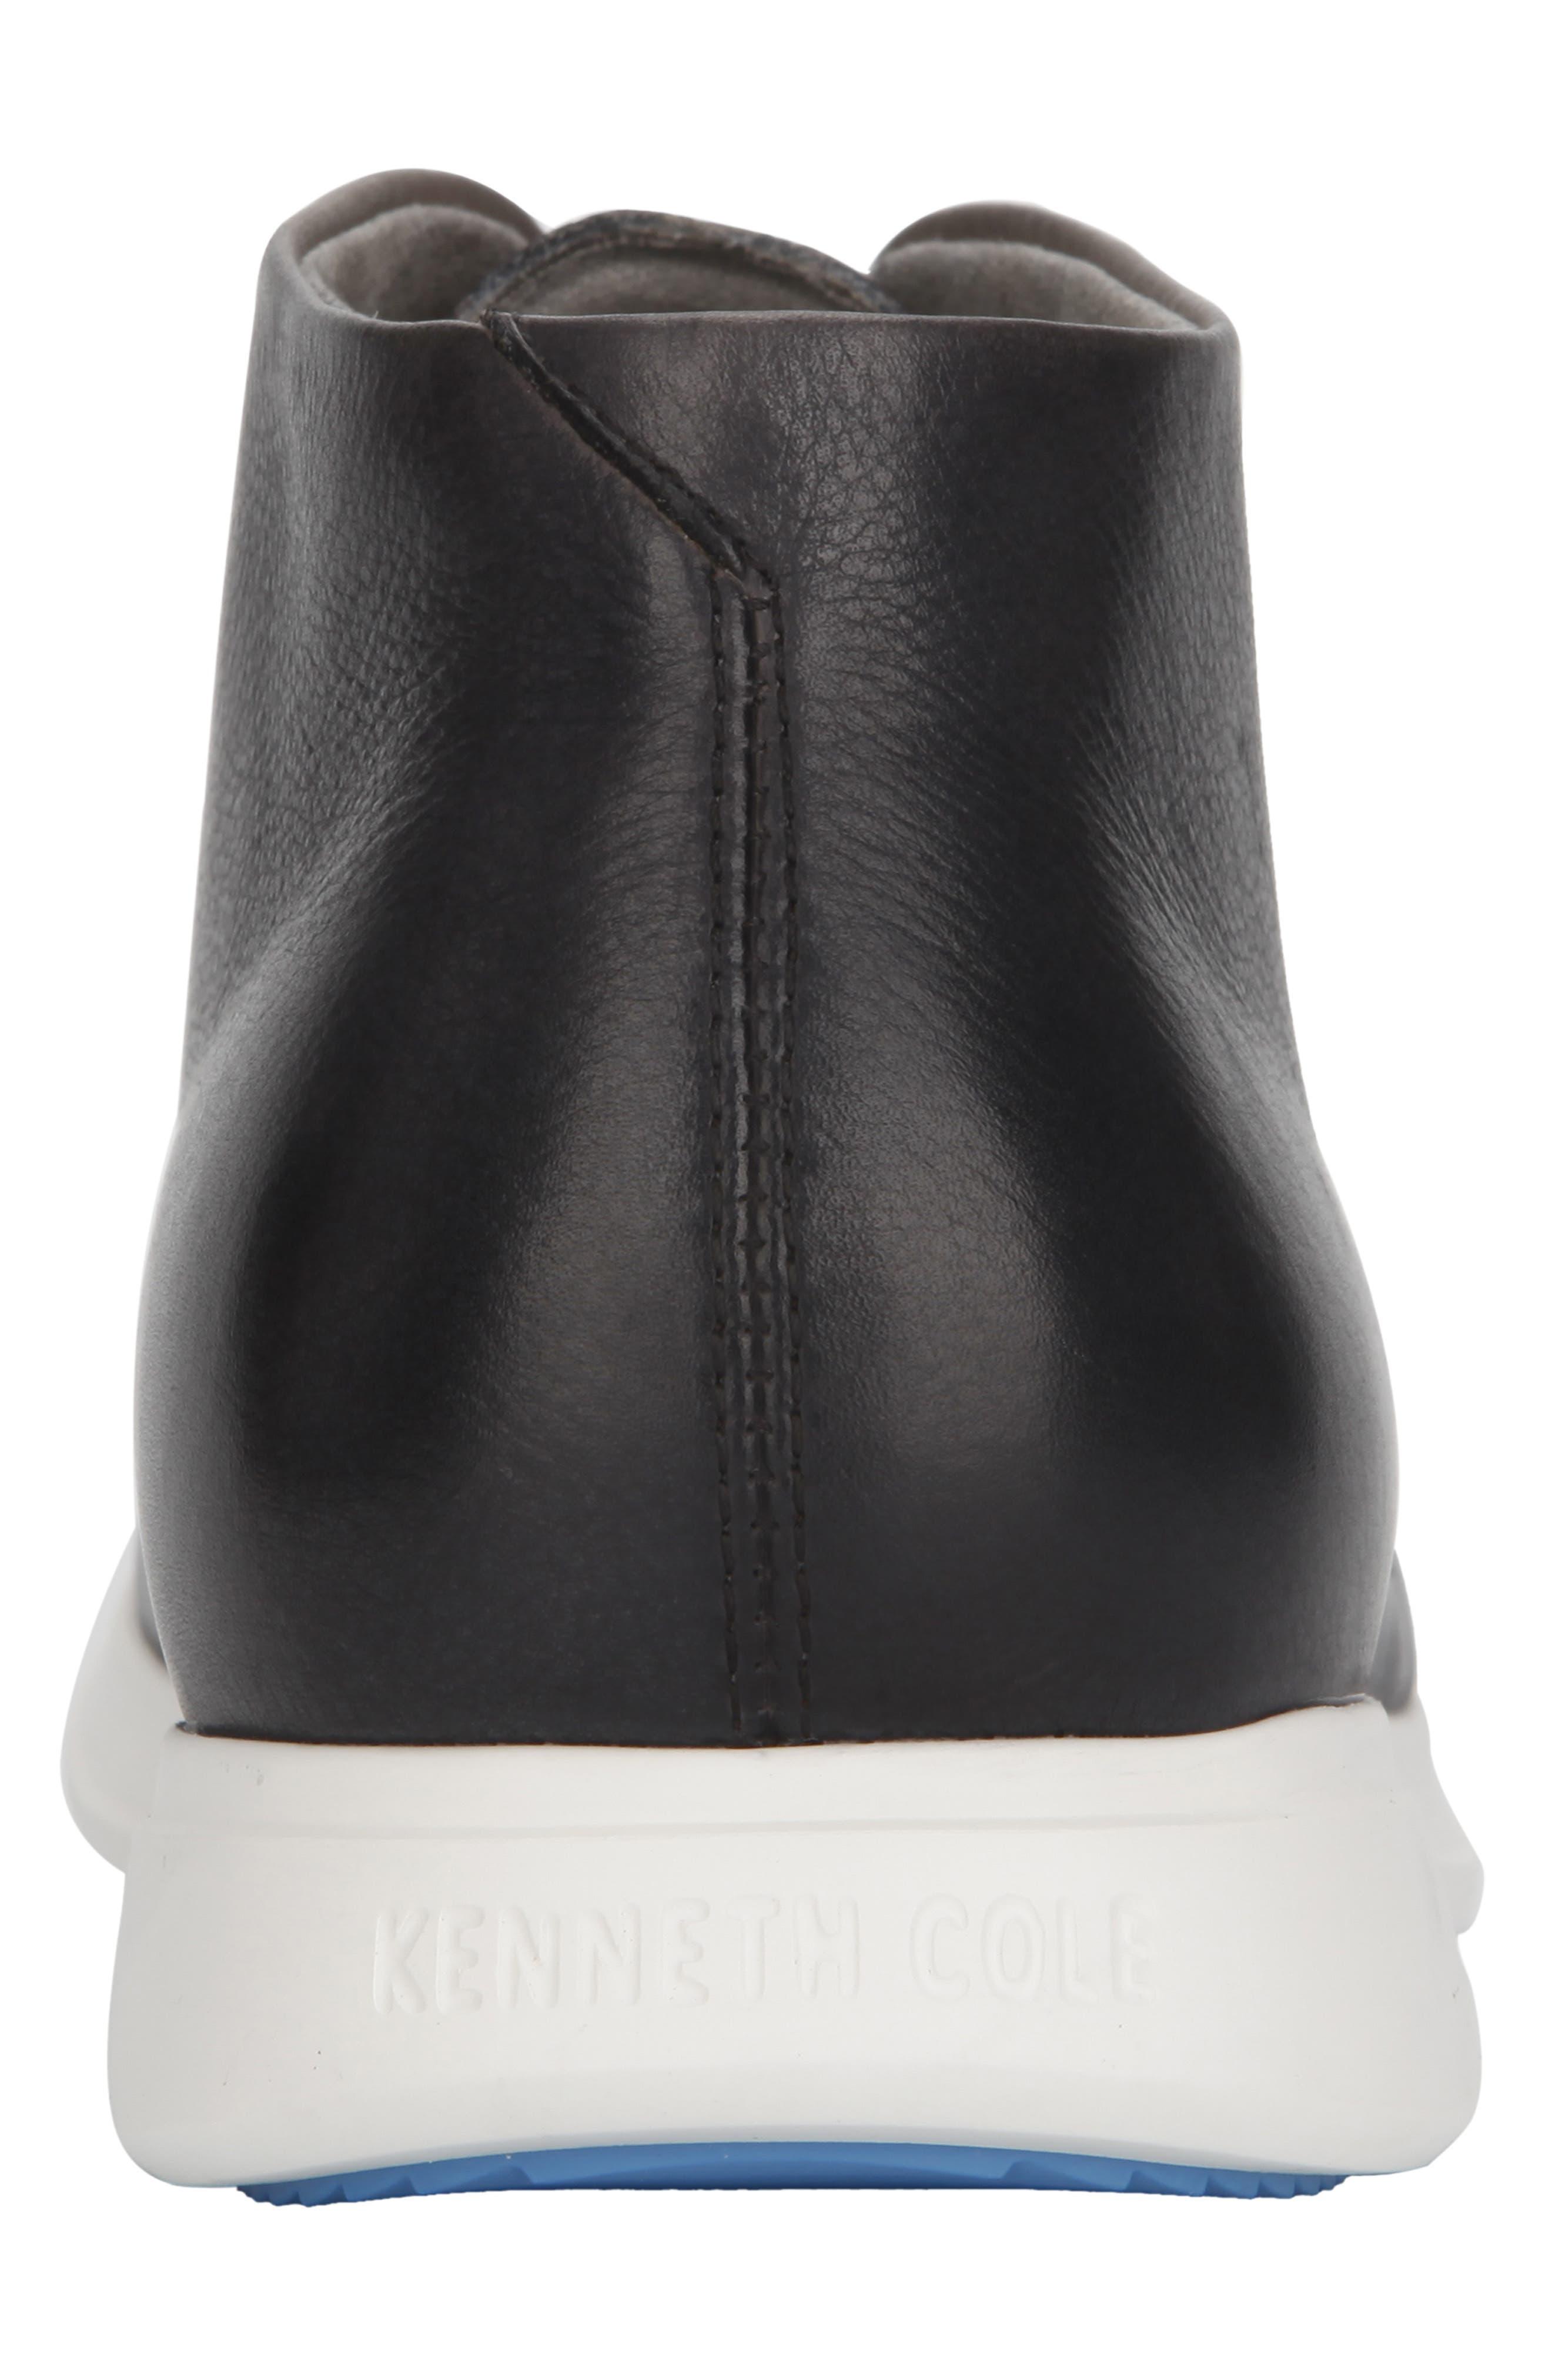 KENNETH COLE NEW YORK, Rocketpod Chukka Sneaker, Alternate thumbnail 5, color, GREY TUMBLED LEATHER